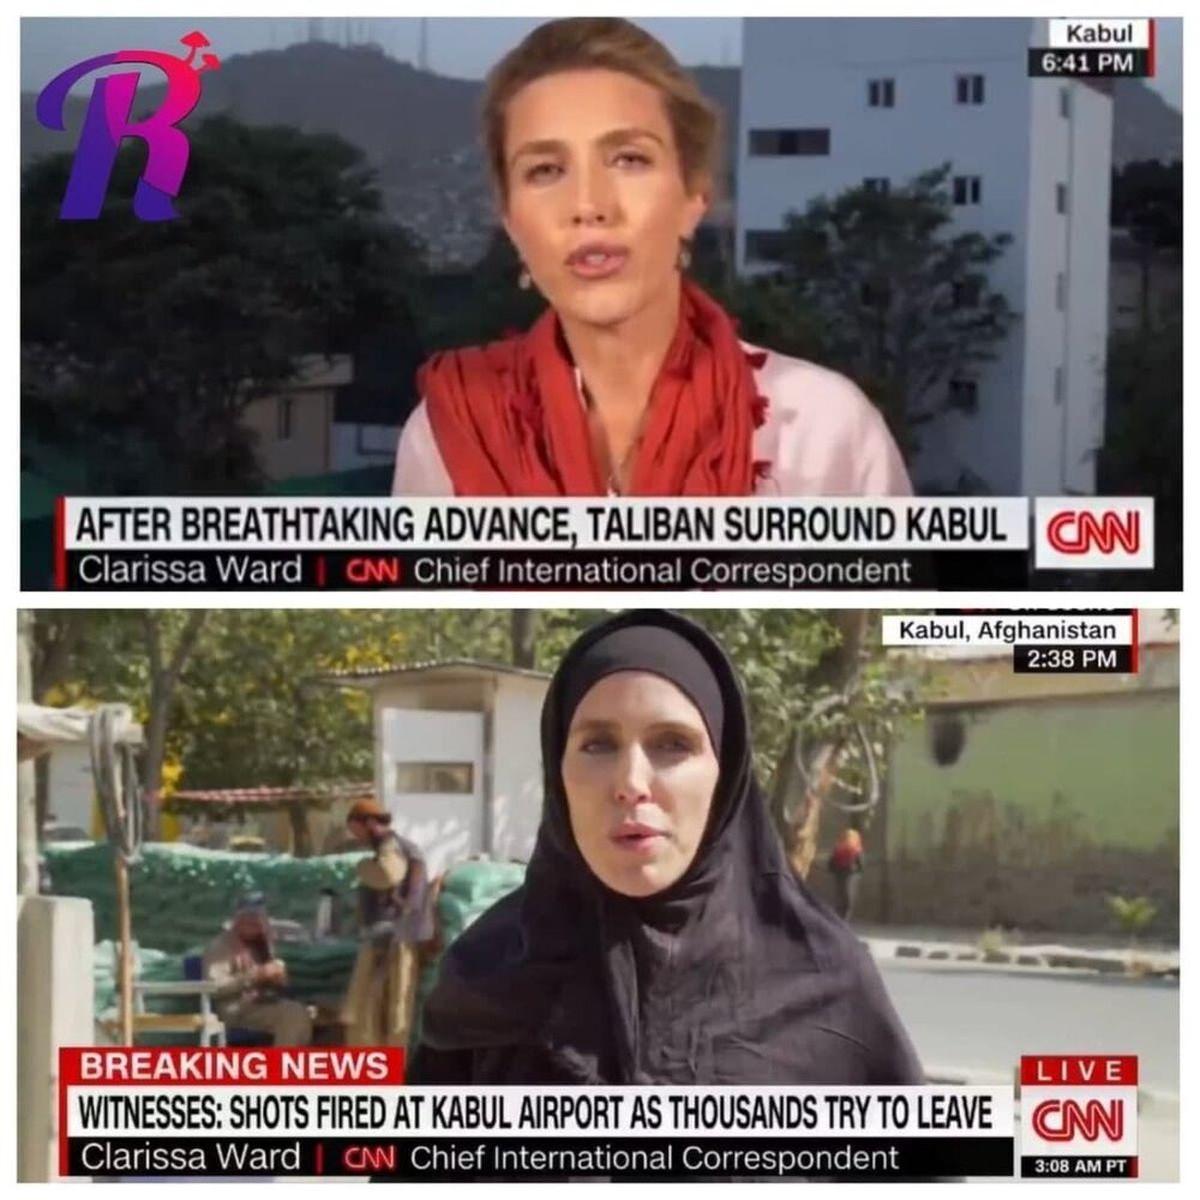 گزارشگر زن CNN در افغانستان قبل و بعد از حضور طالبان!